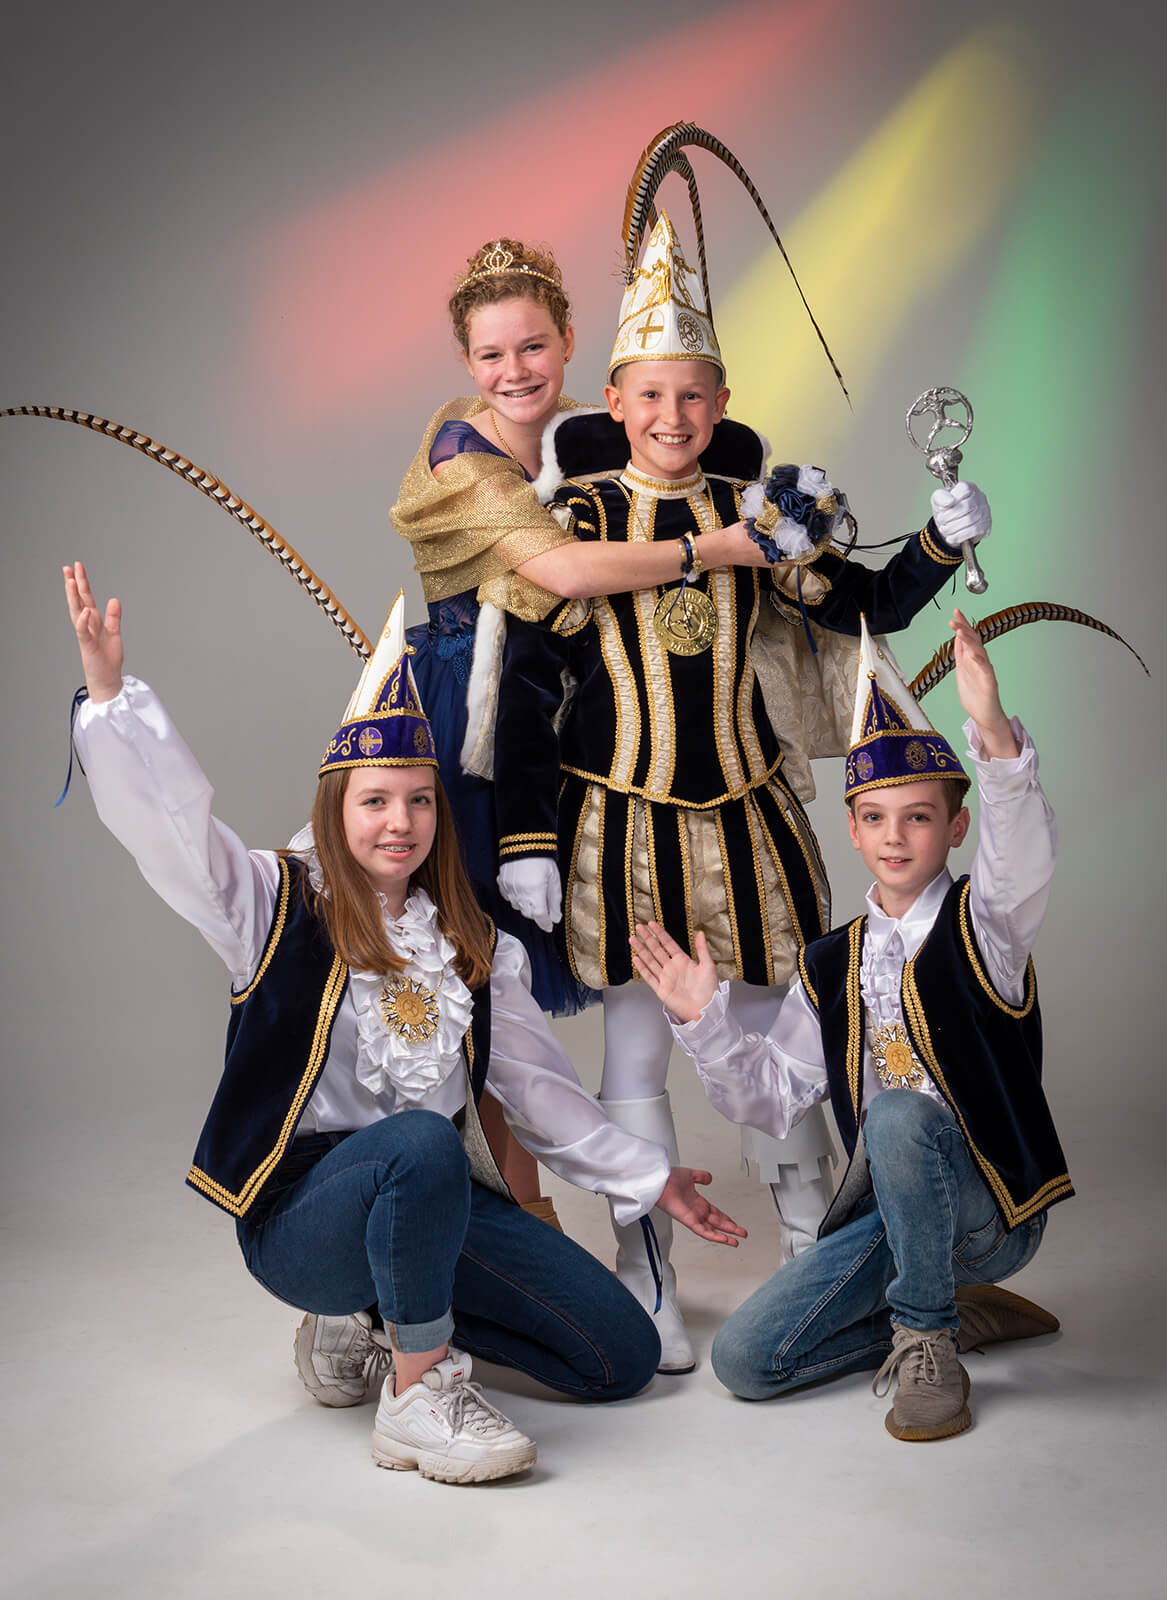 Daan Rijckx & Fenne Sniekers Jeugdprins en Jeugdprinses VV De Gangmaekers